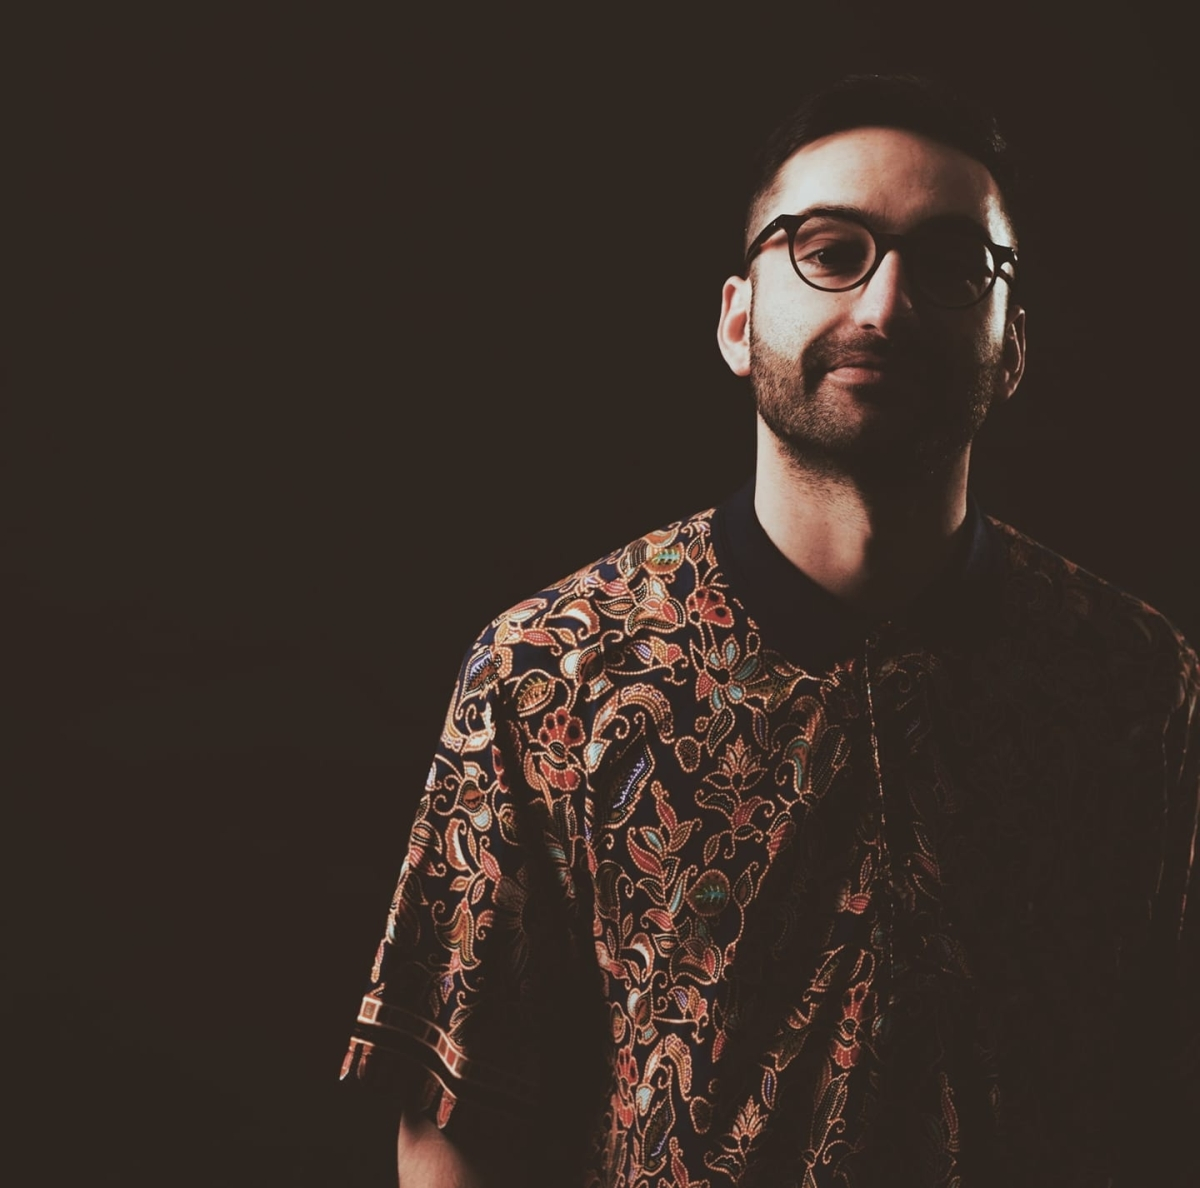 Coming up: Atsou – Sleepwalk Town EP(Connected)